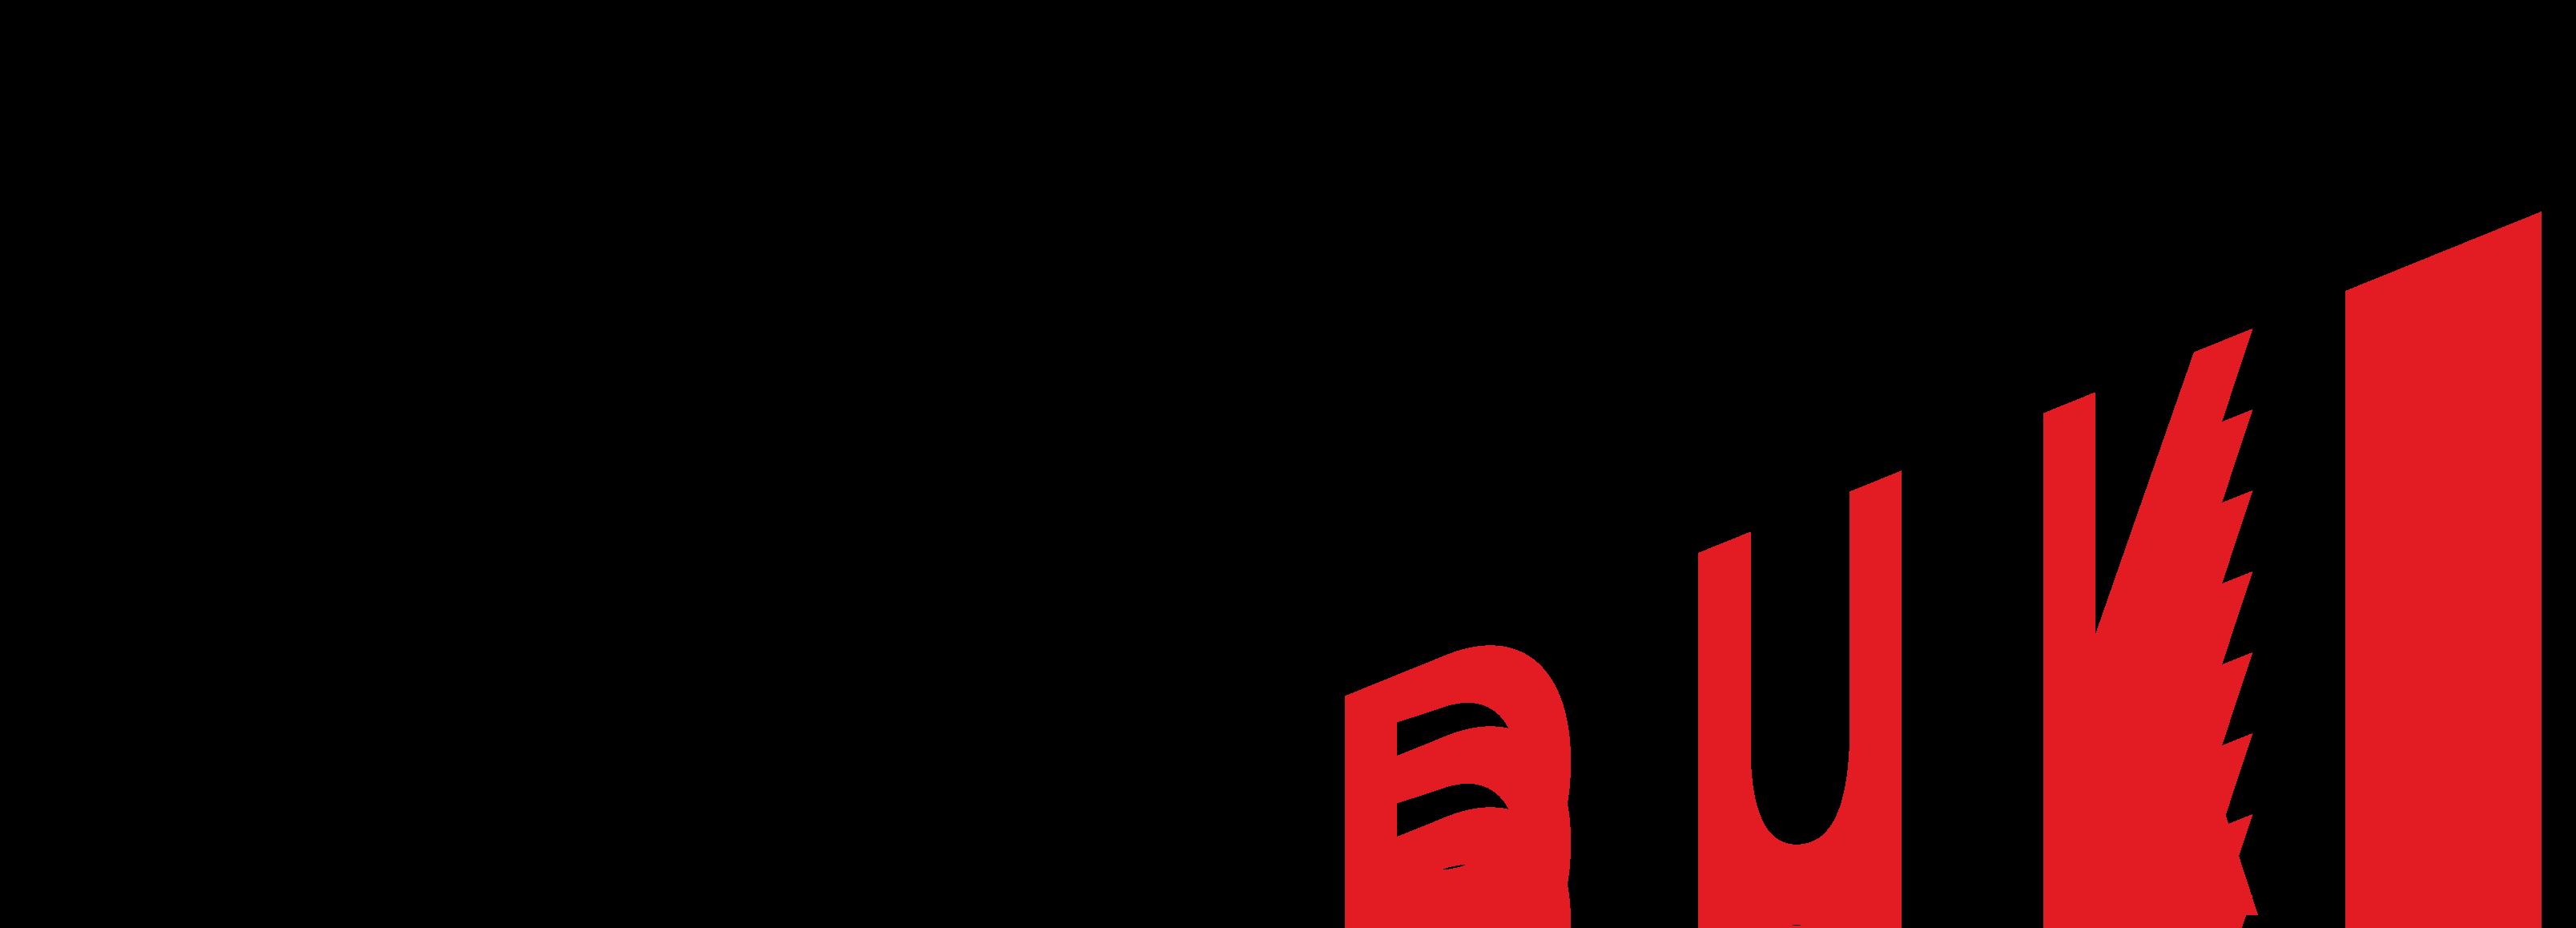 logo gecon budownictwo